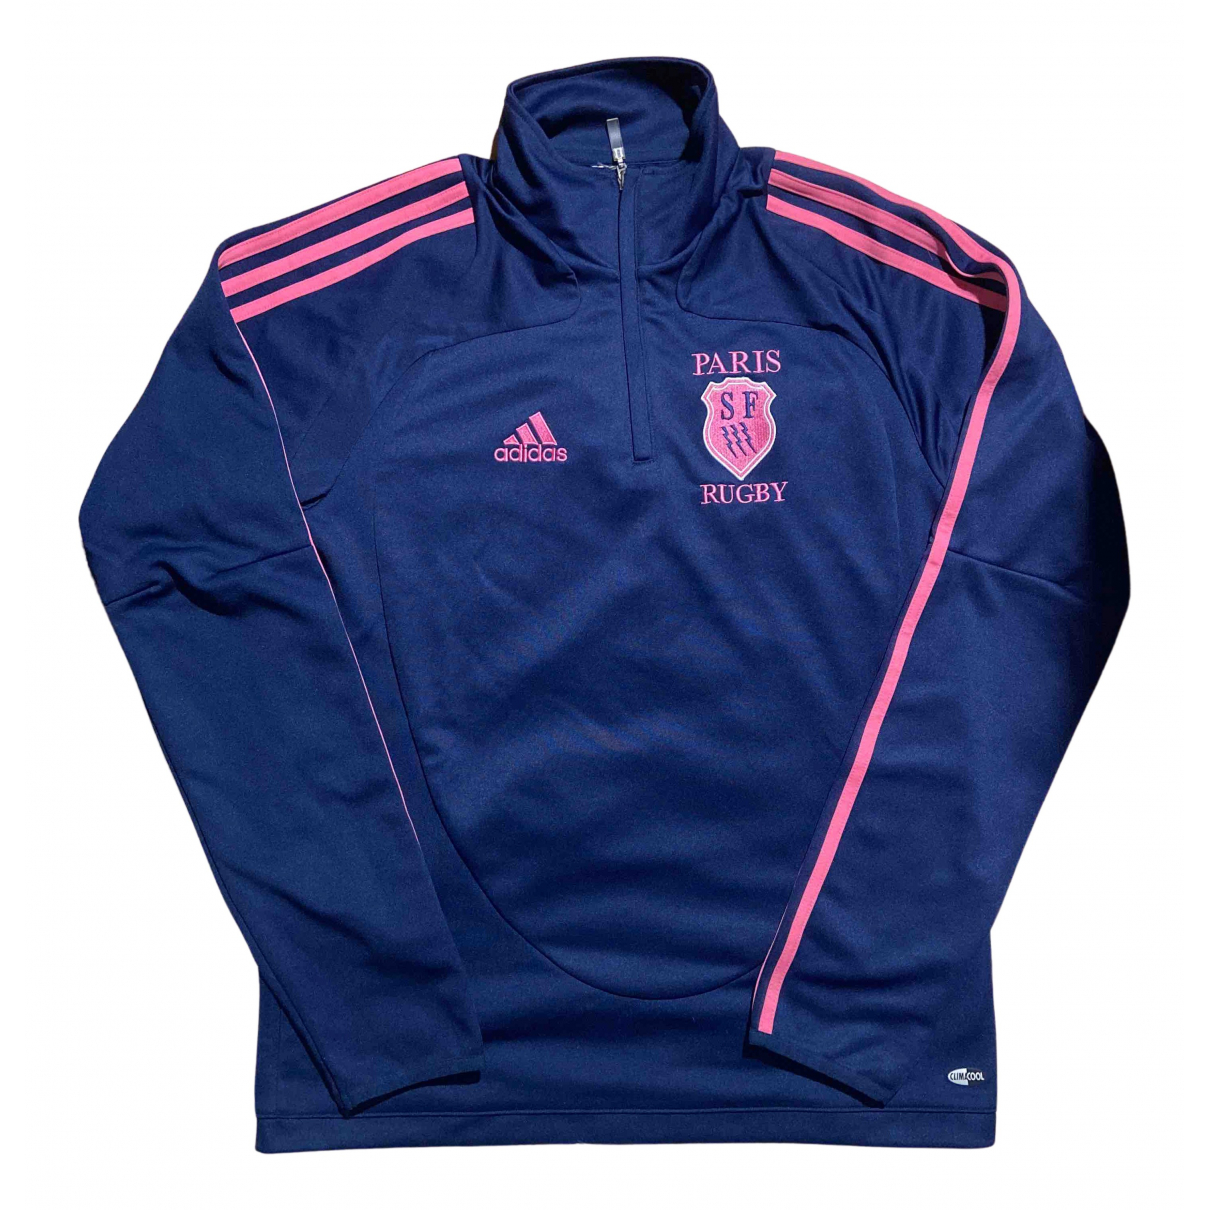 Adidas N Navy Knitwear & Sweatshirts for Men S International